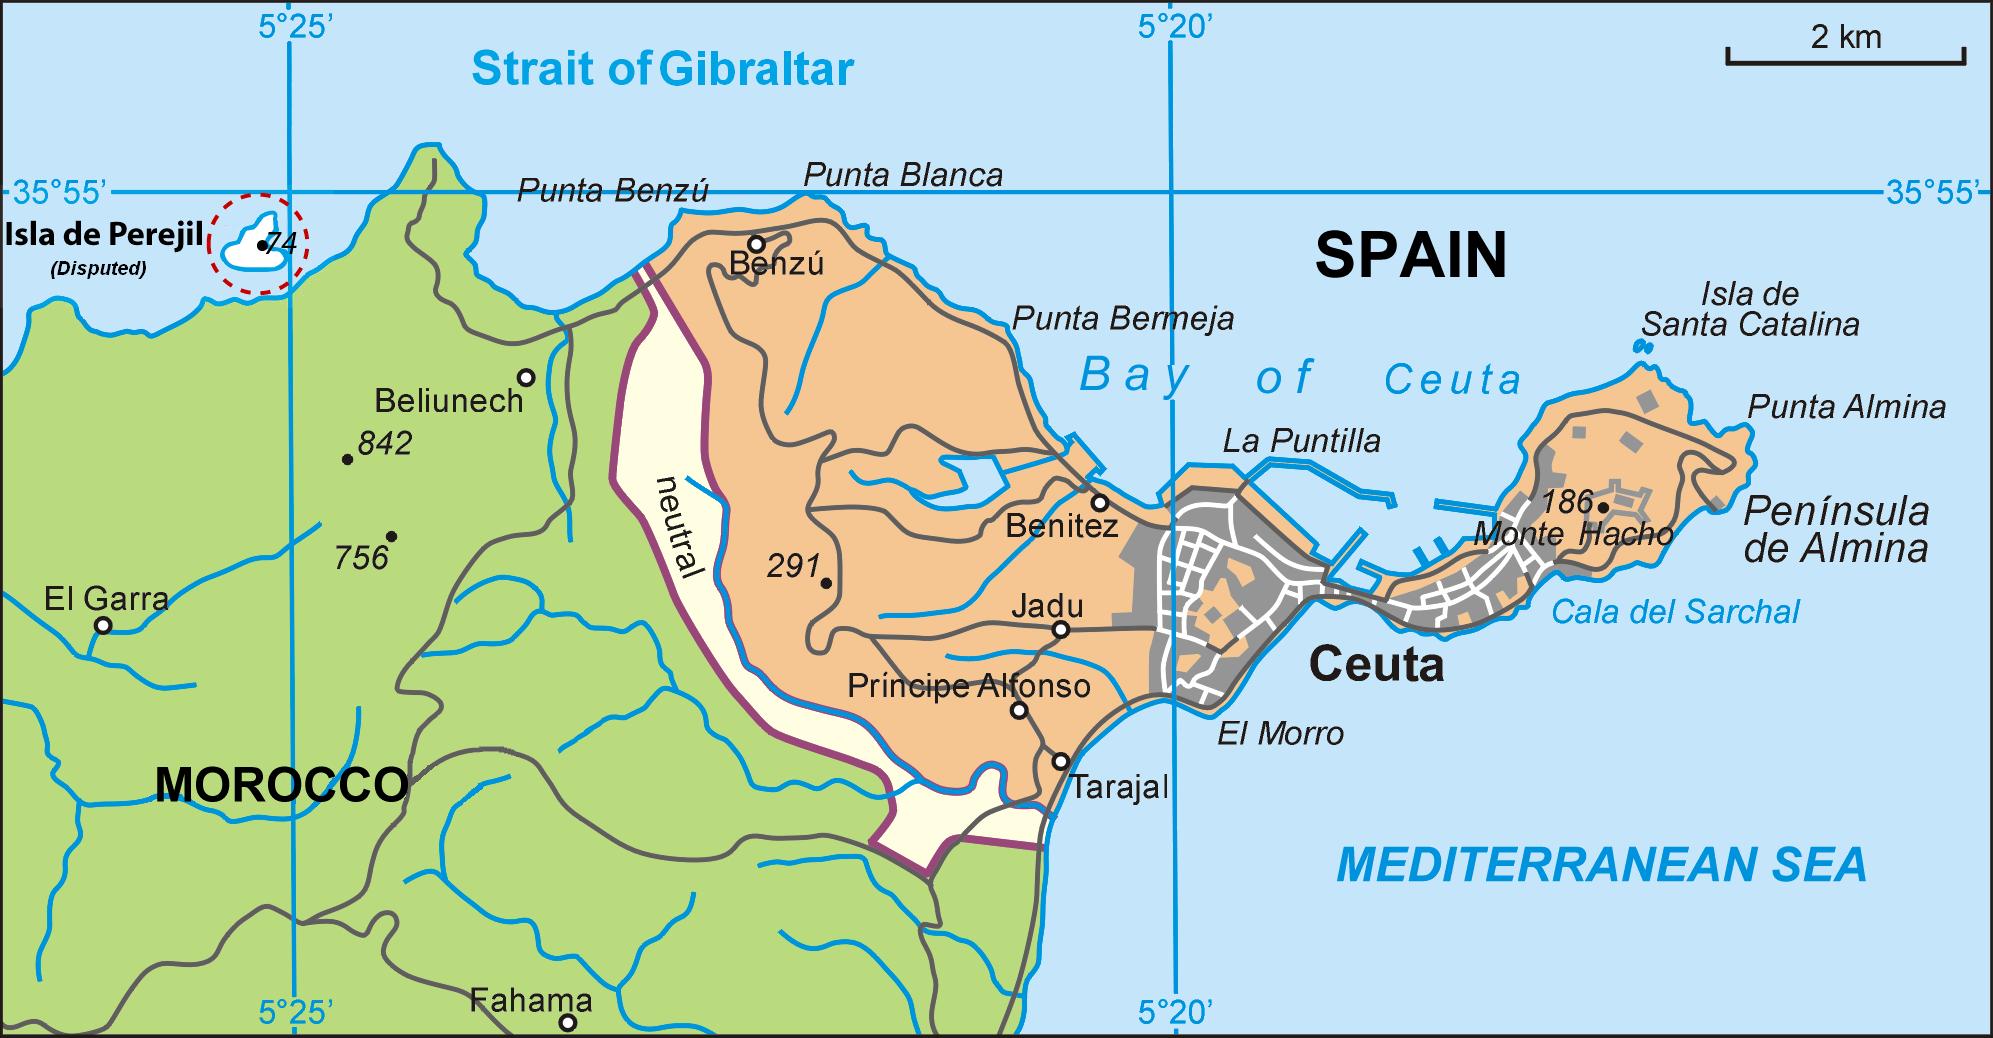 ceuta mapa File:Ceuta (neutral).PNG   Wikimedia Commons ceuta mapa